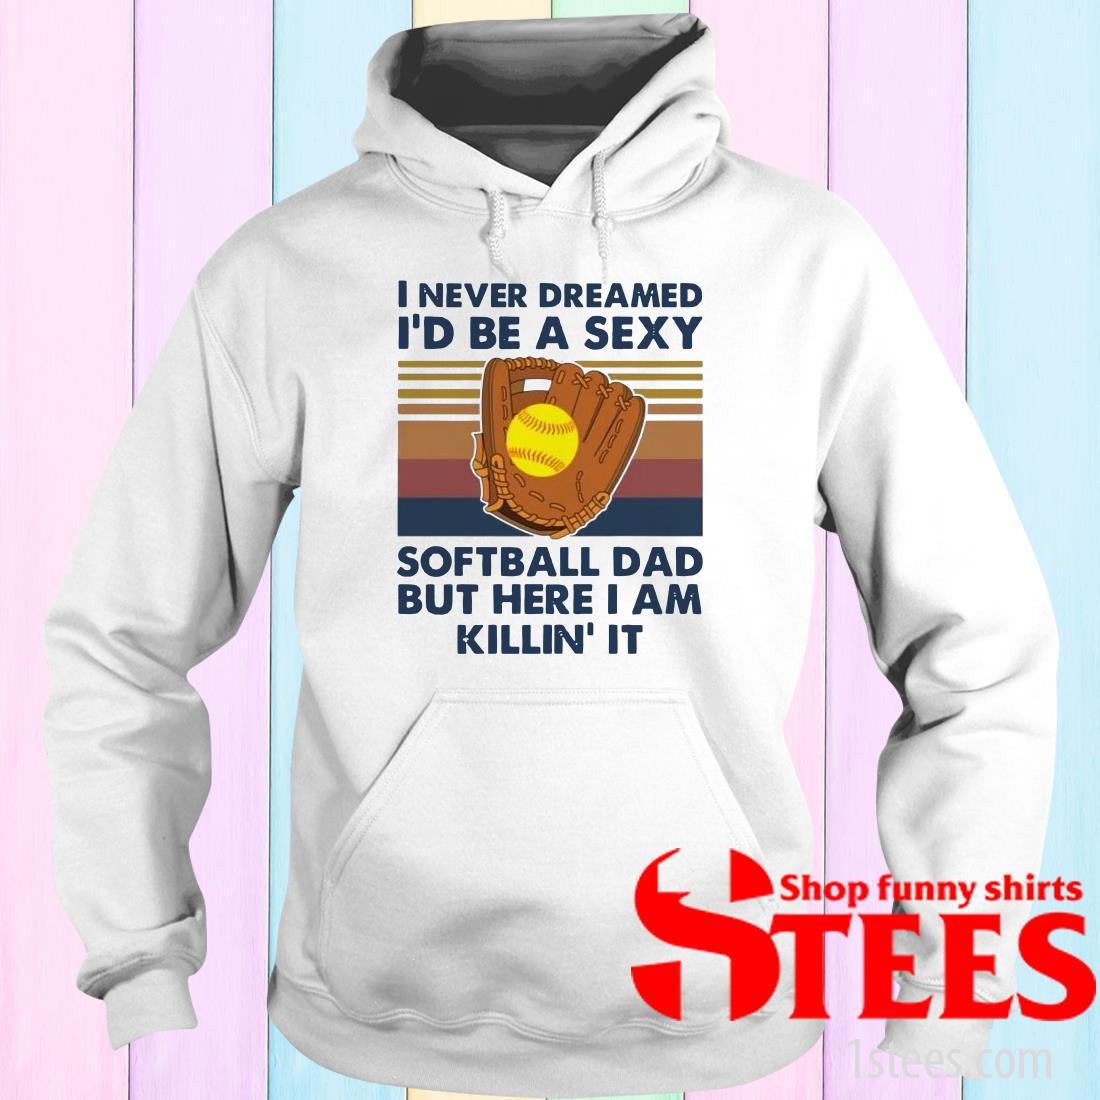 I Never Dreamed I'd Be A Sexy Softball Dad Vintage Shirt